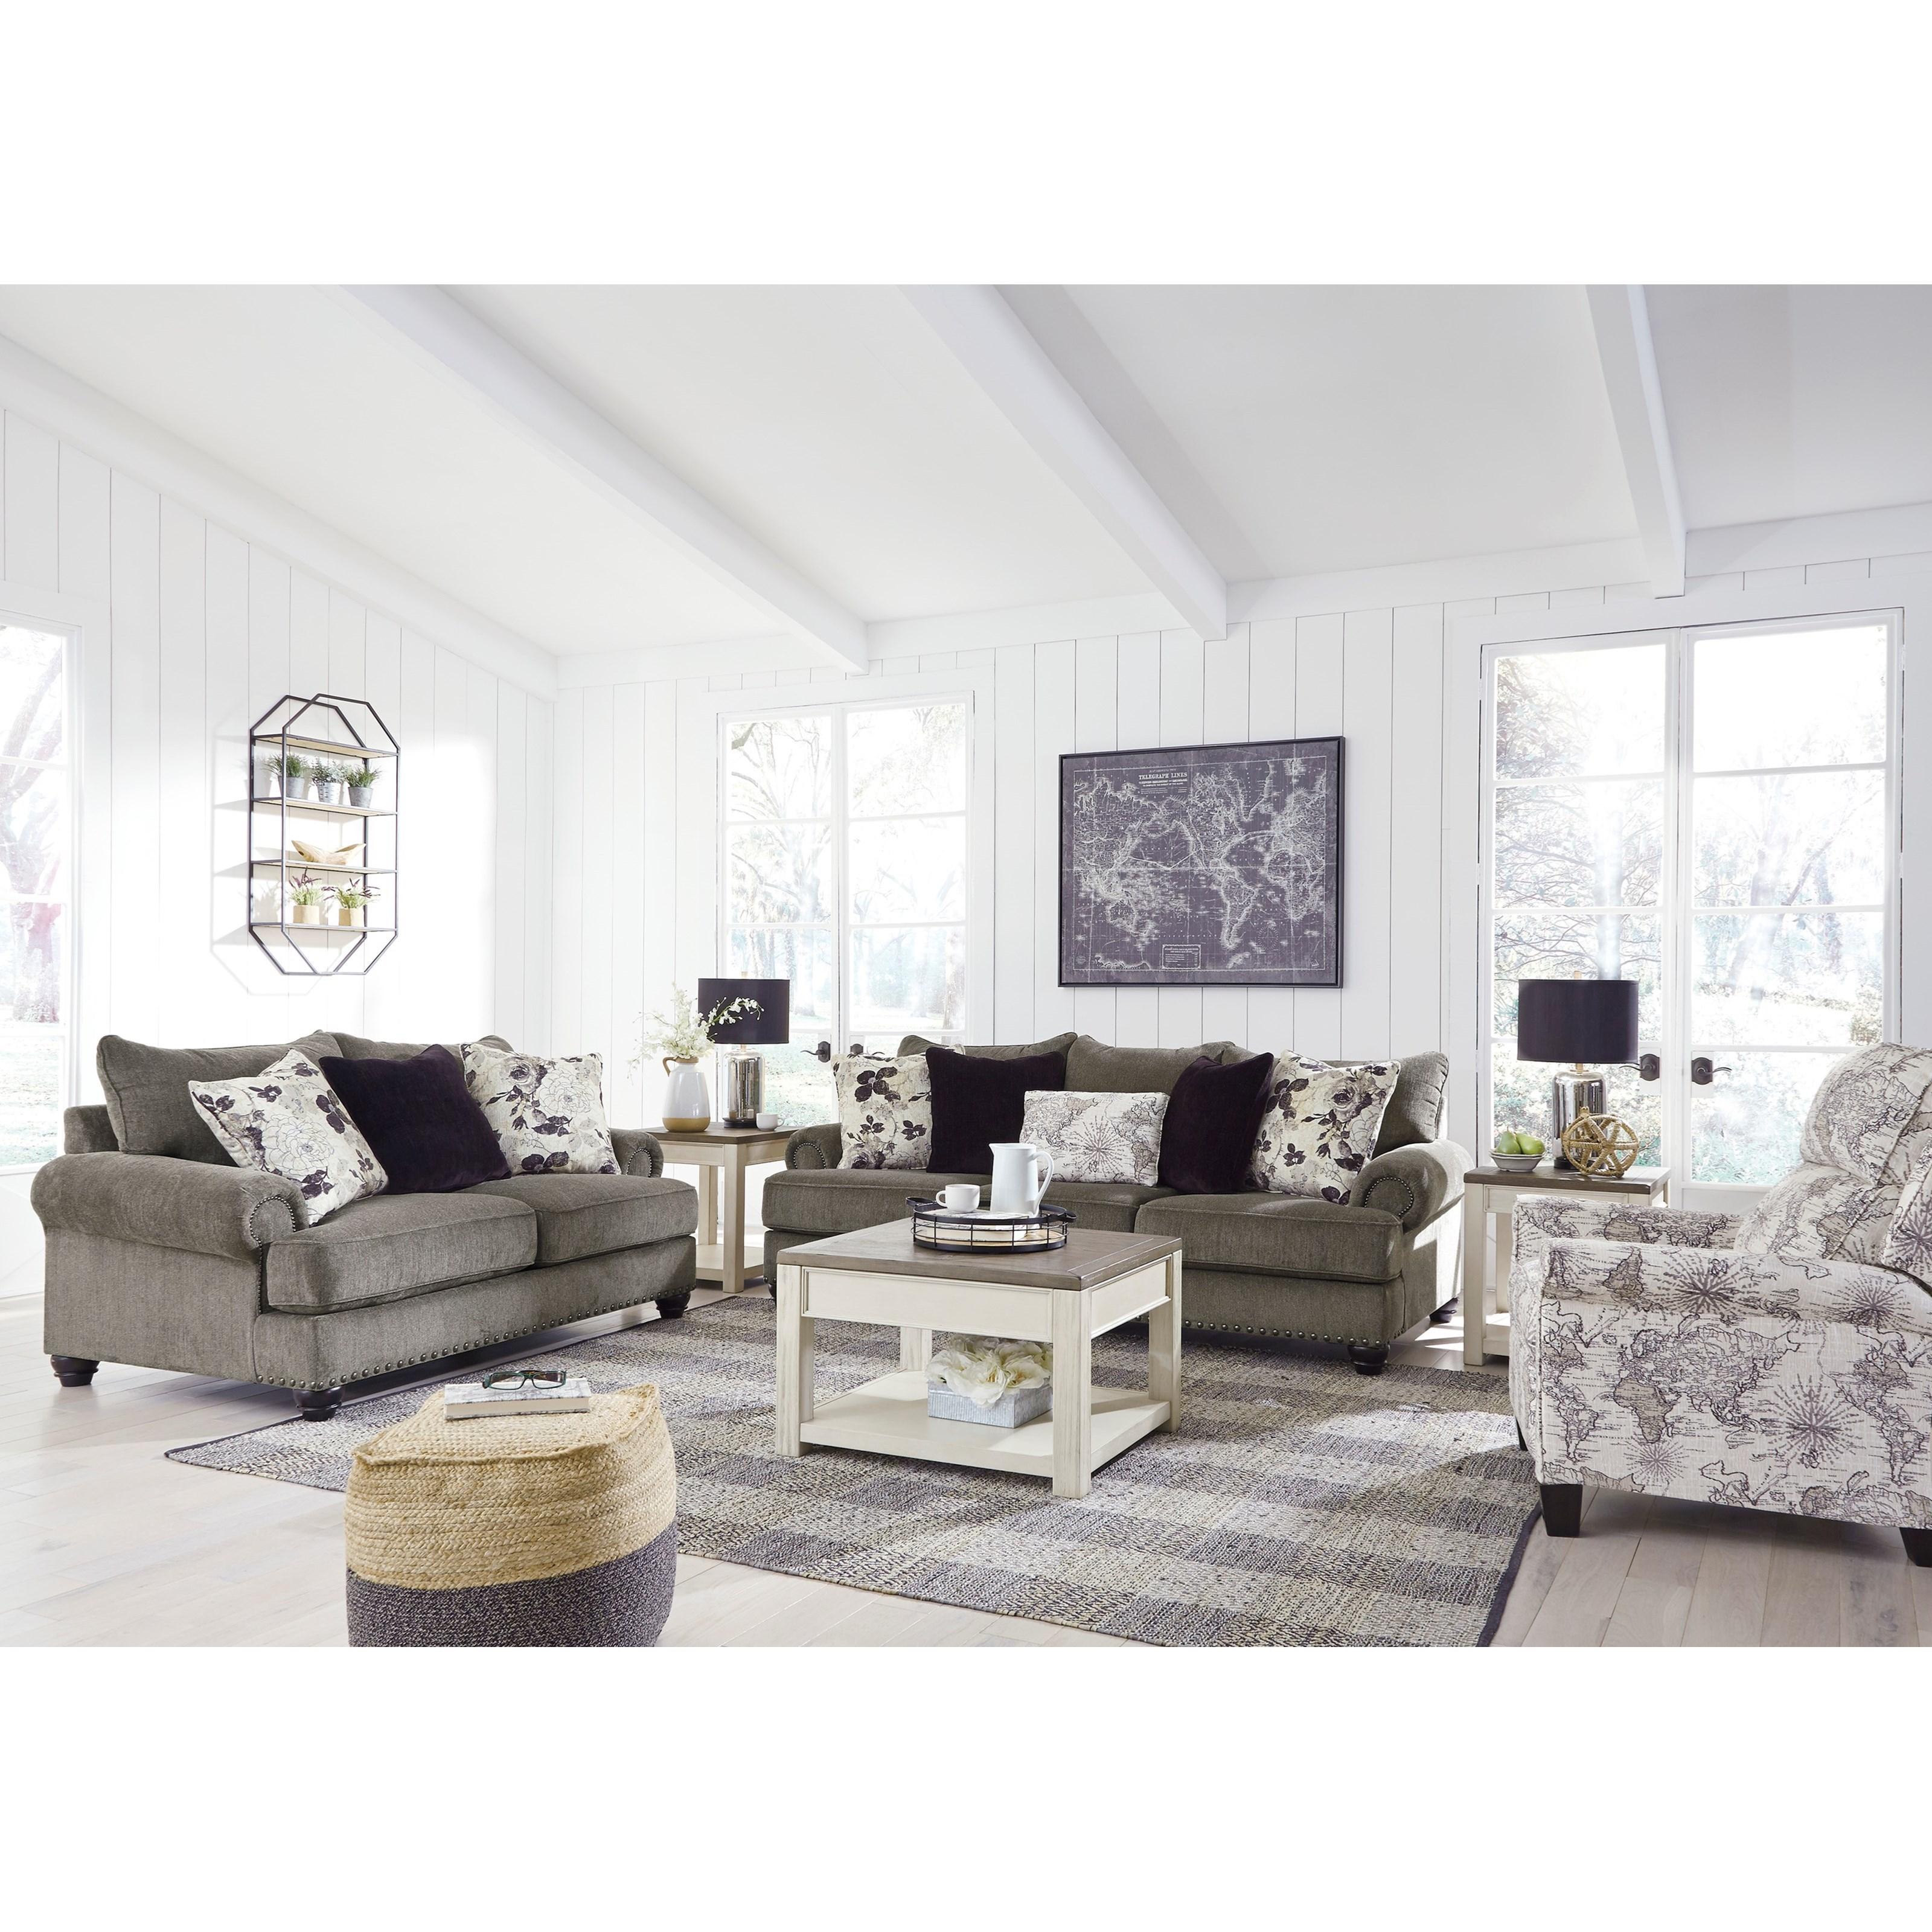 Sembler Living Room Group by Ashley Furniture Benchcraft at Del Sol Furniture